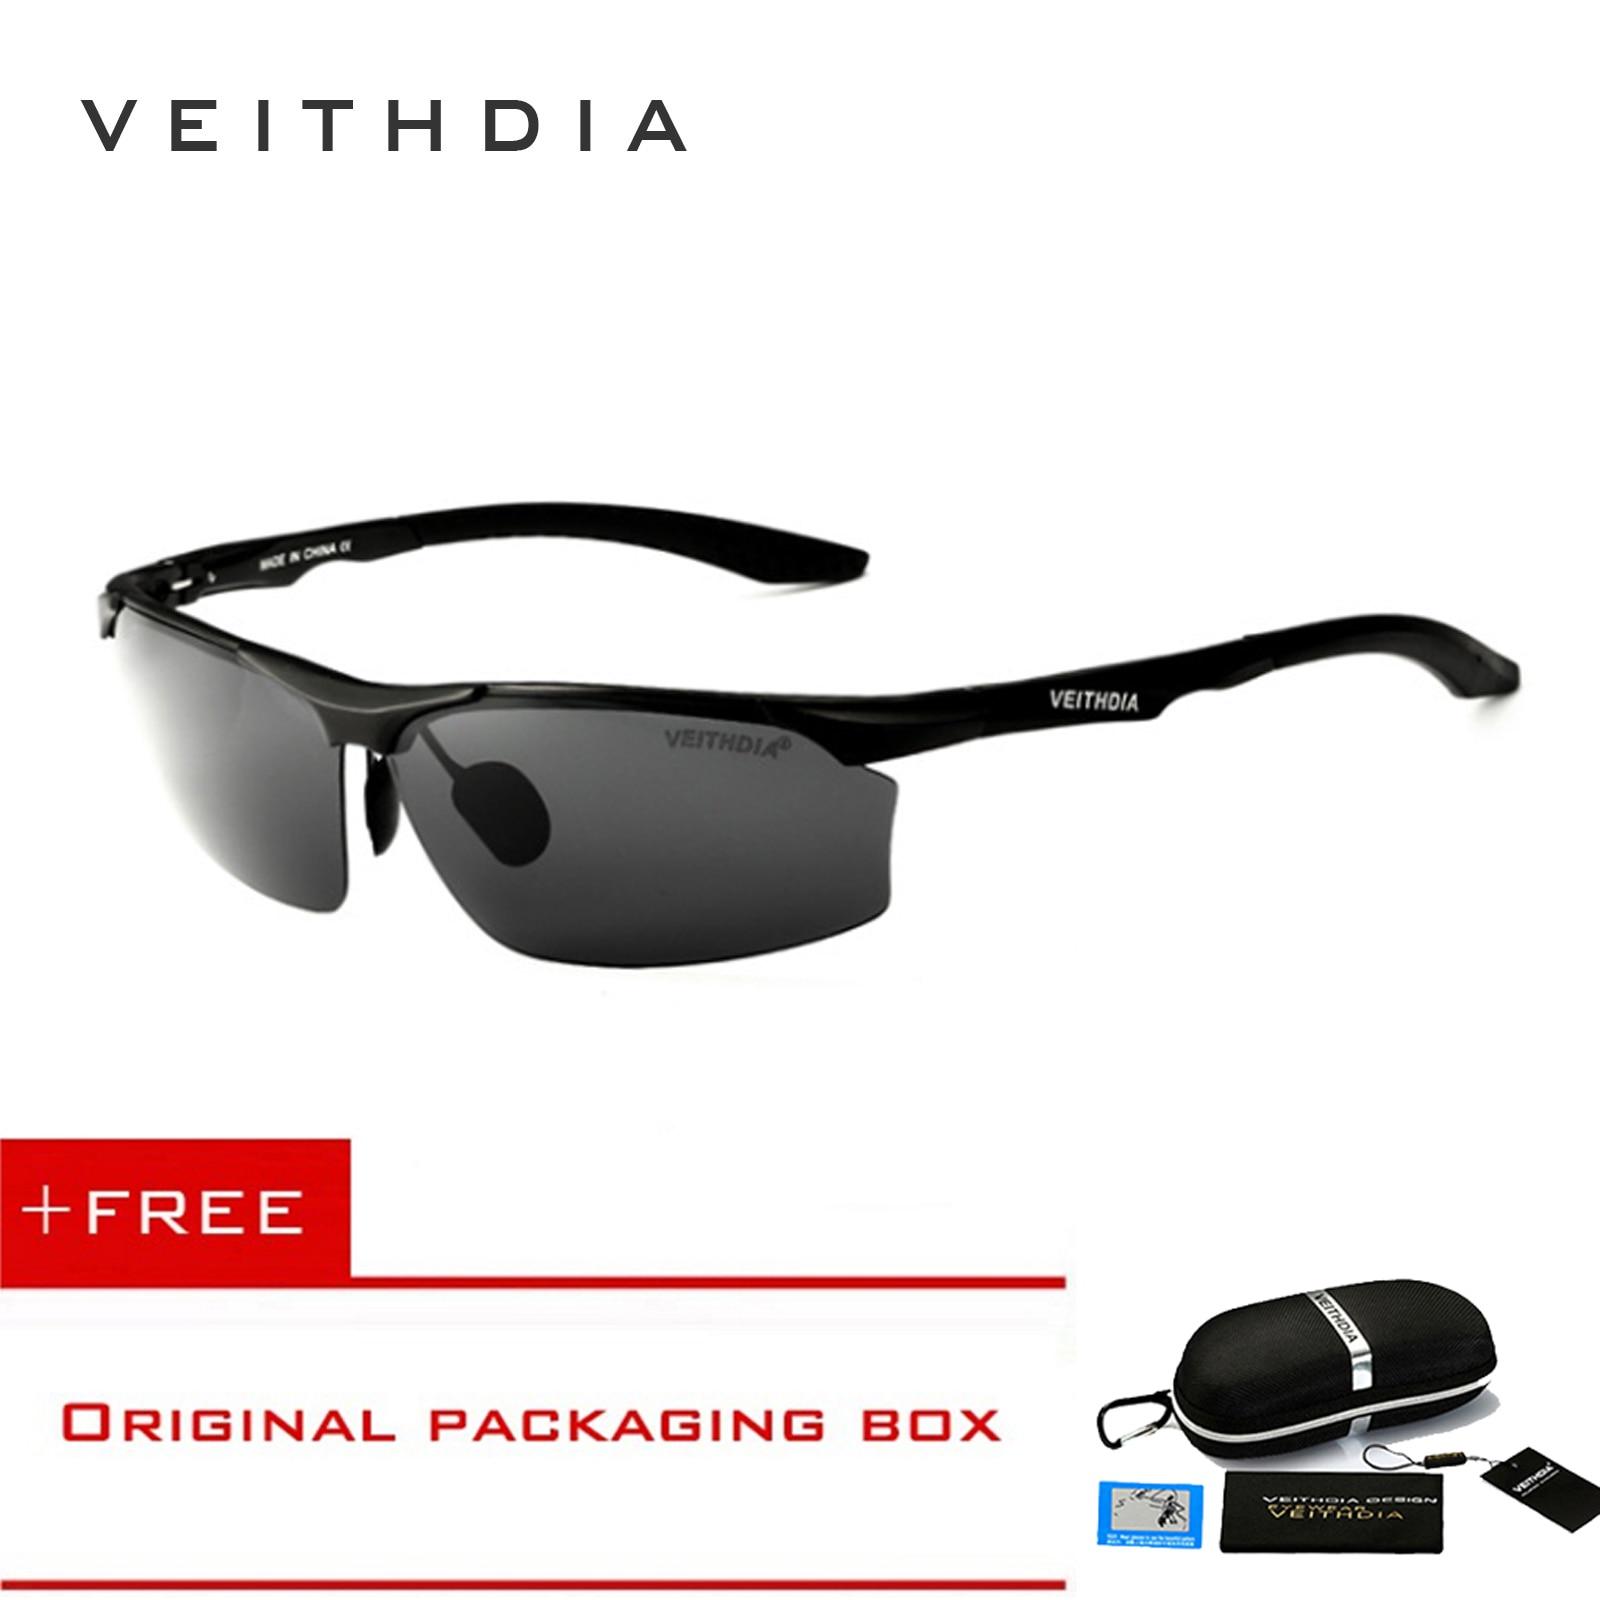 VEITHDIA Semi-rimless Aluminum Magnesium Brand Polarizerd Sunglasses Men Sun Glass Driving Glasses Mirror Eyewear for Men shades